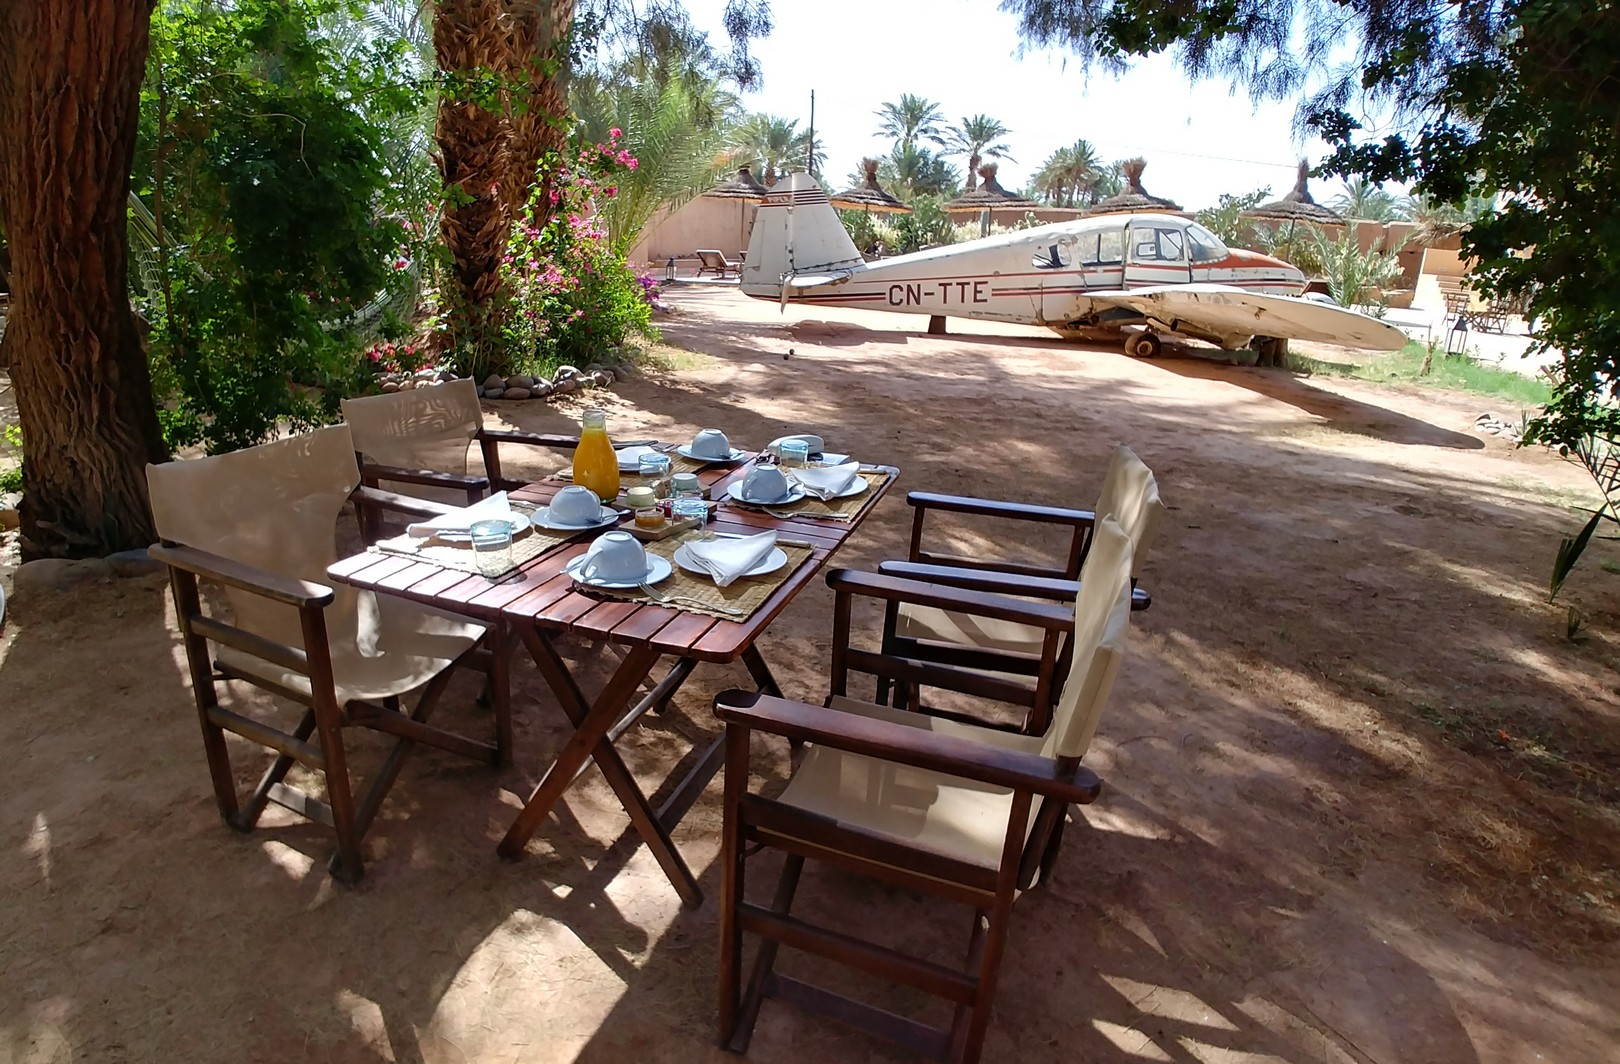 Maroc - Petit déjeuner dans le jardin de l'Azalai Desert Lodge à Zagora